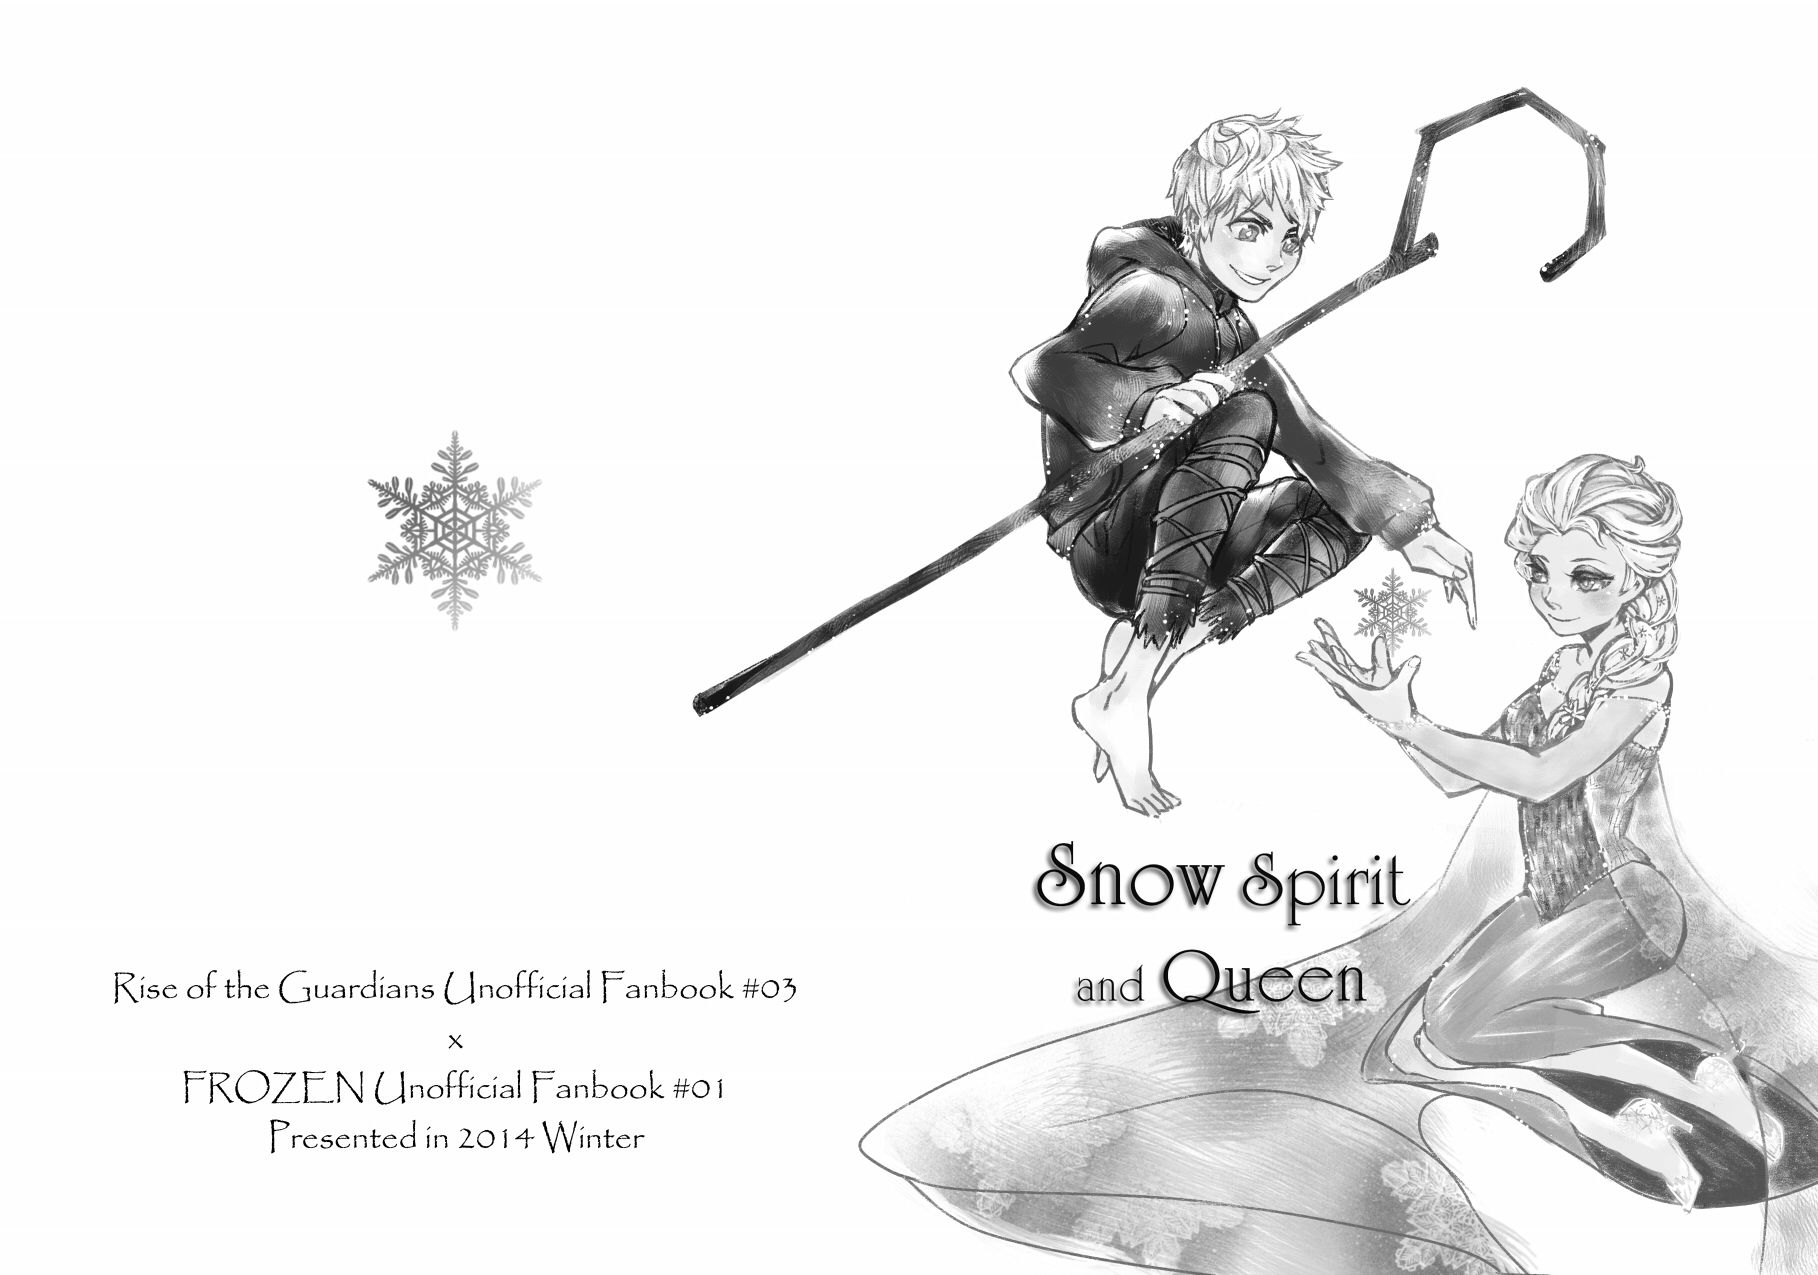 Snow Spirit and Queen